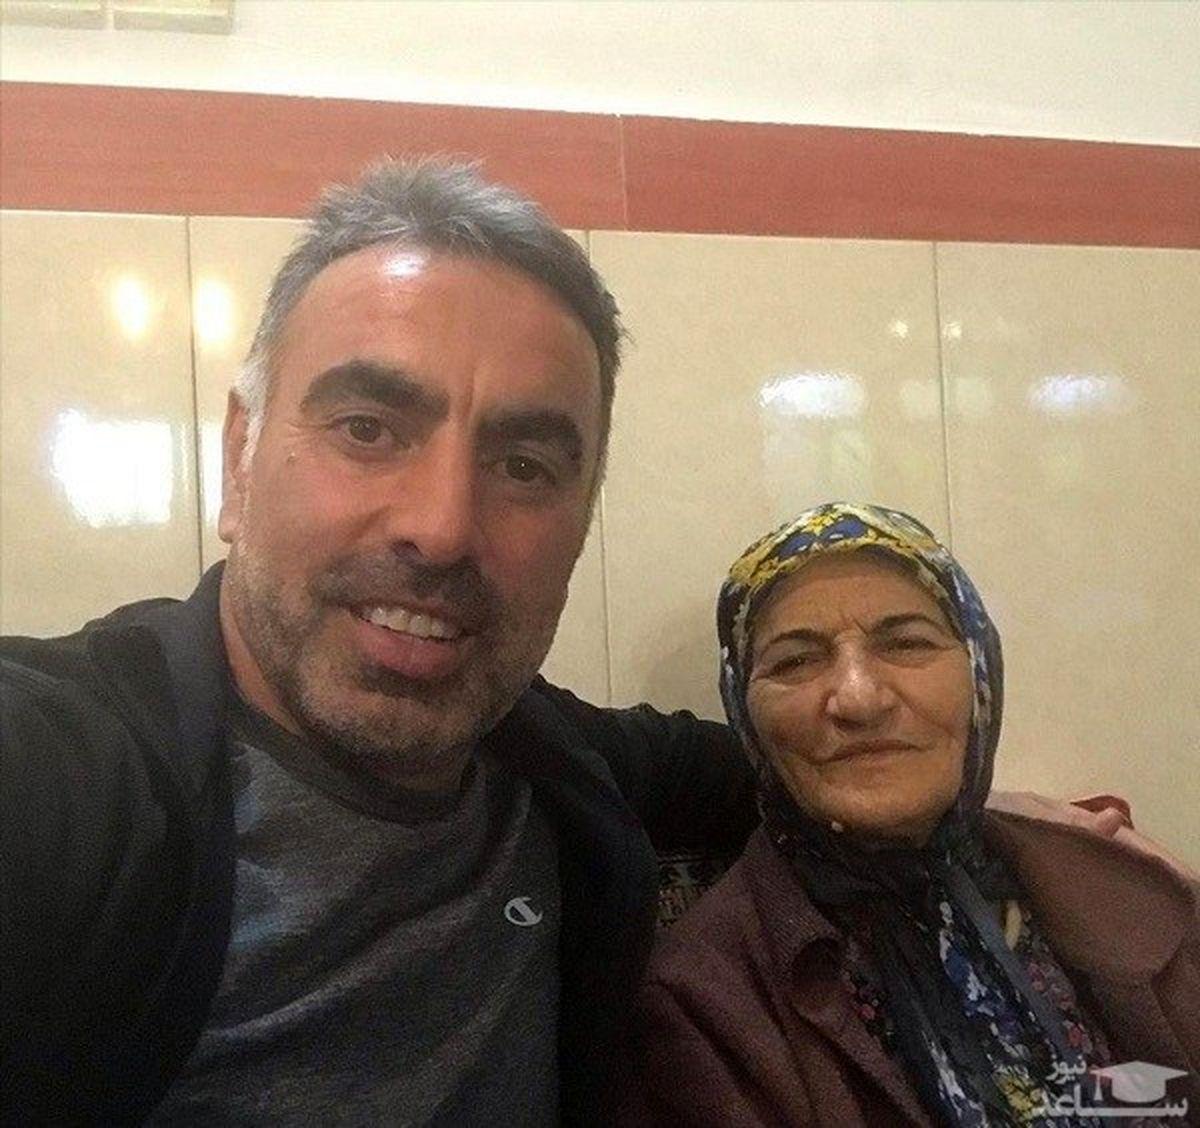 روابط خصوصی محمود فکری با همسرش + عکس